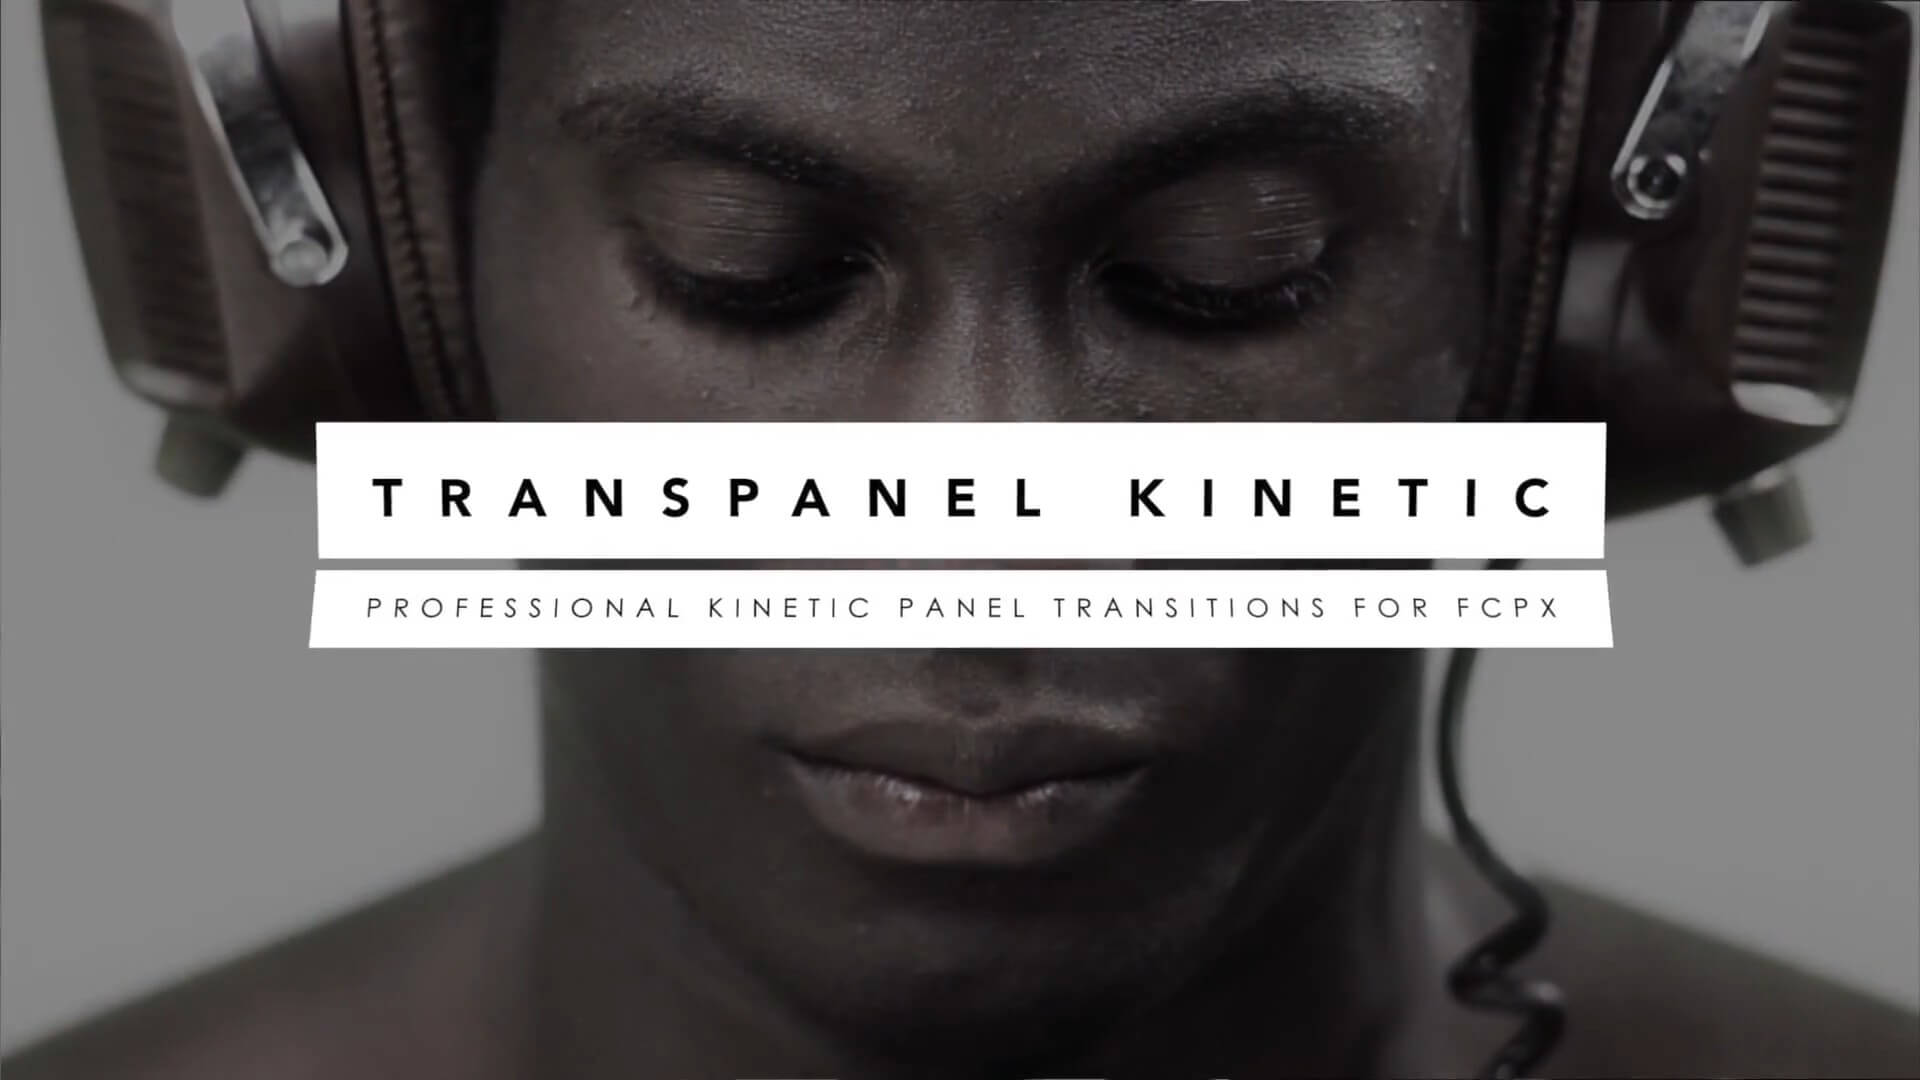 FCPX三维空间图文翻转过渡插件 TransPanel Kinetic